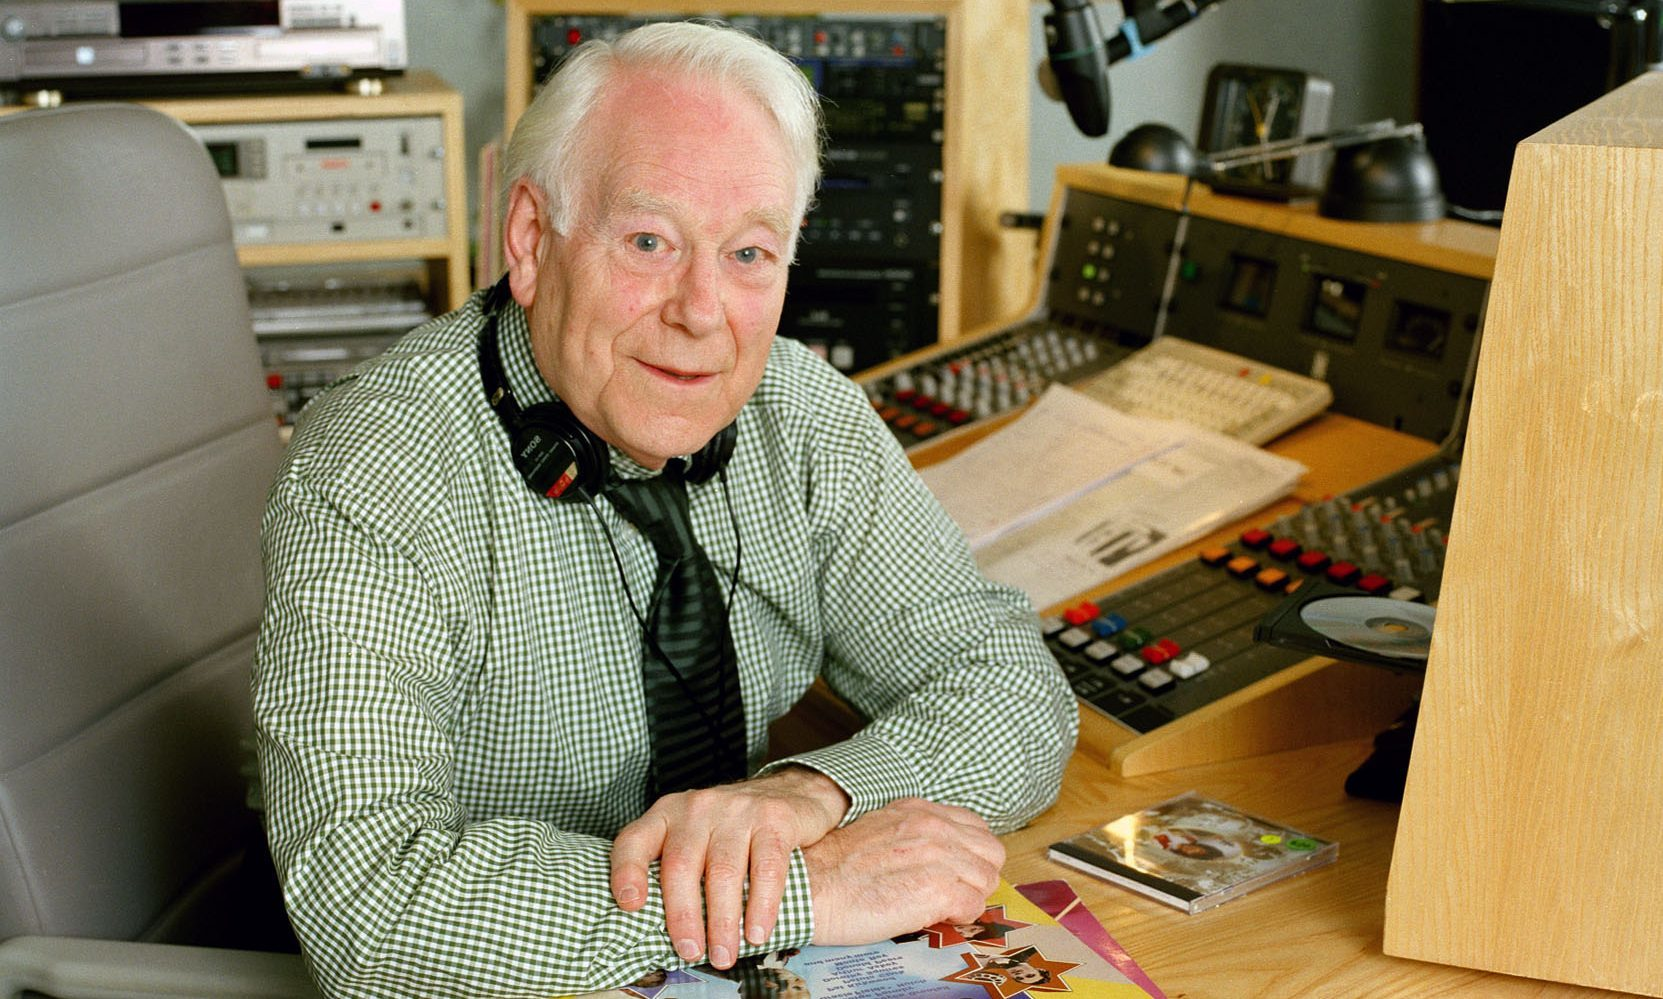 Desmond Carrington from his studio in Scotland.  Picture taken in 2004.